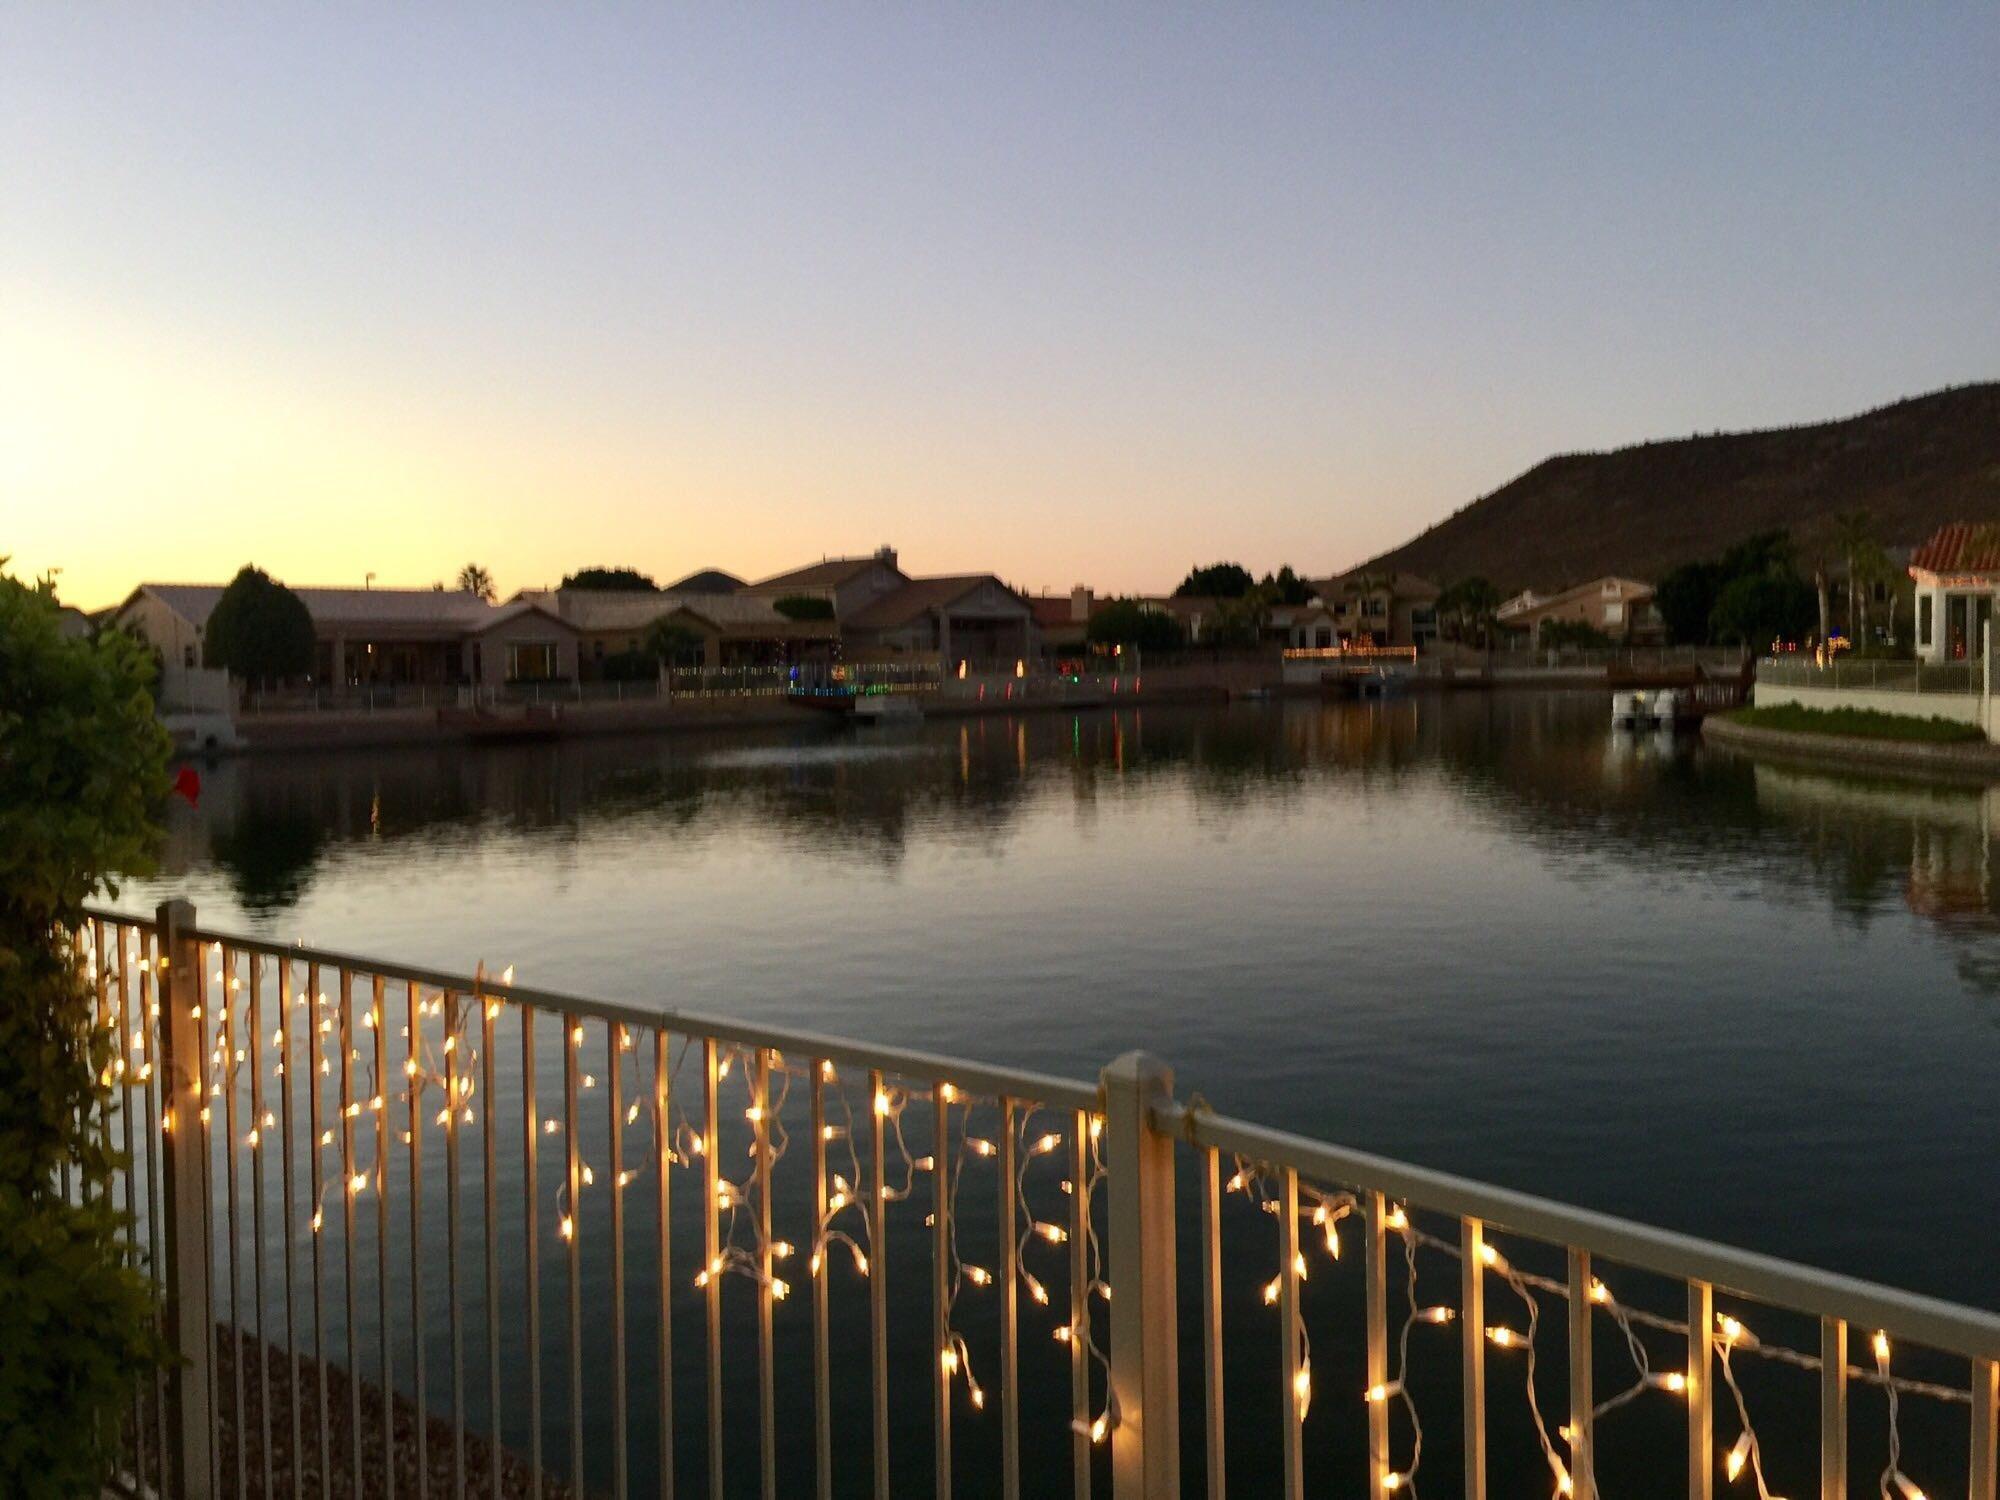 Arrowhead Lakes, Glendale, Arizona, United States of America